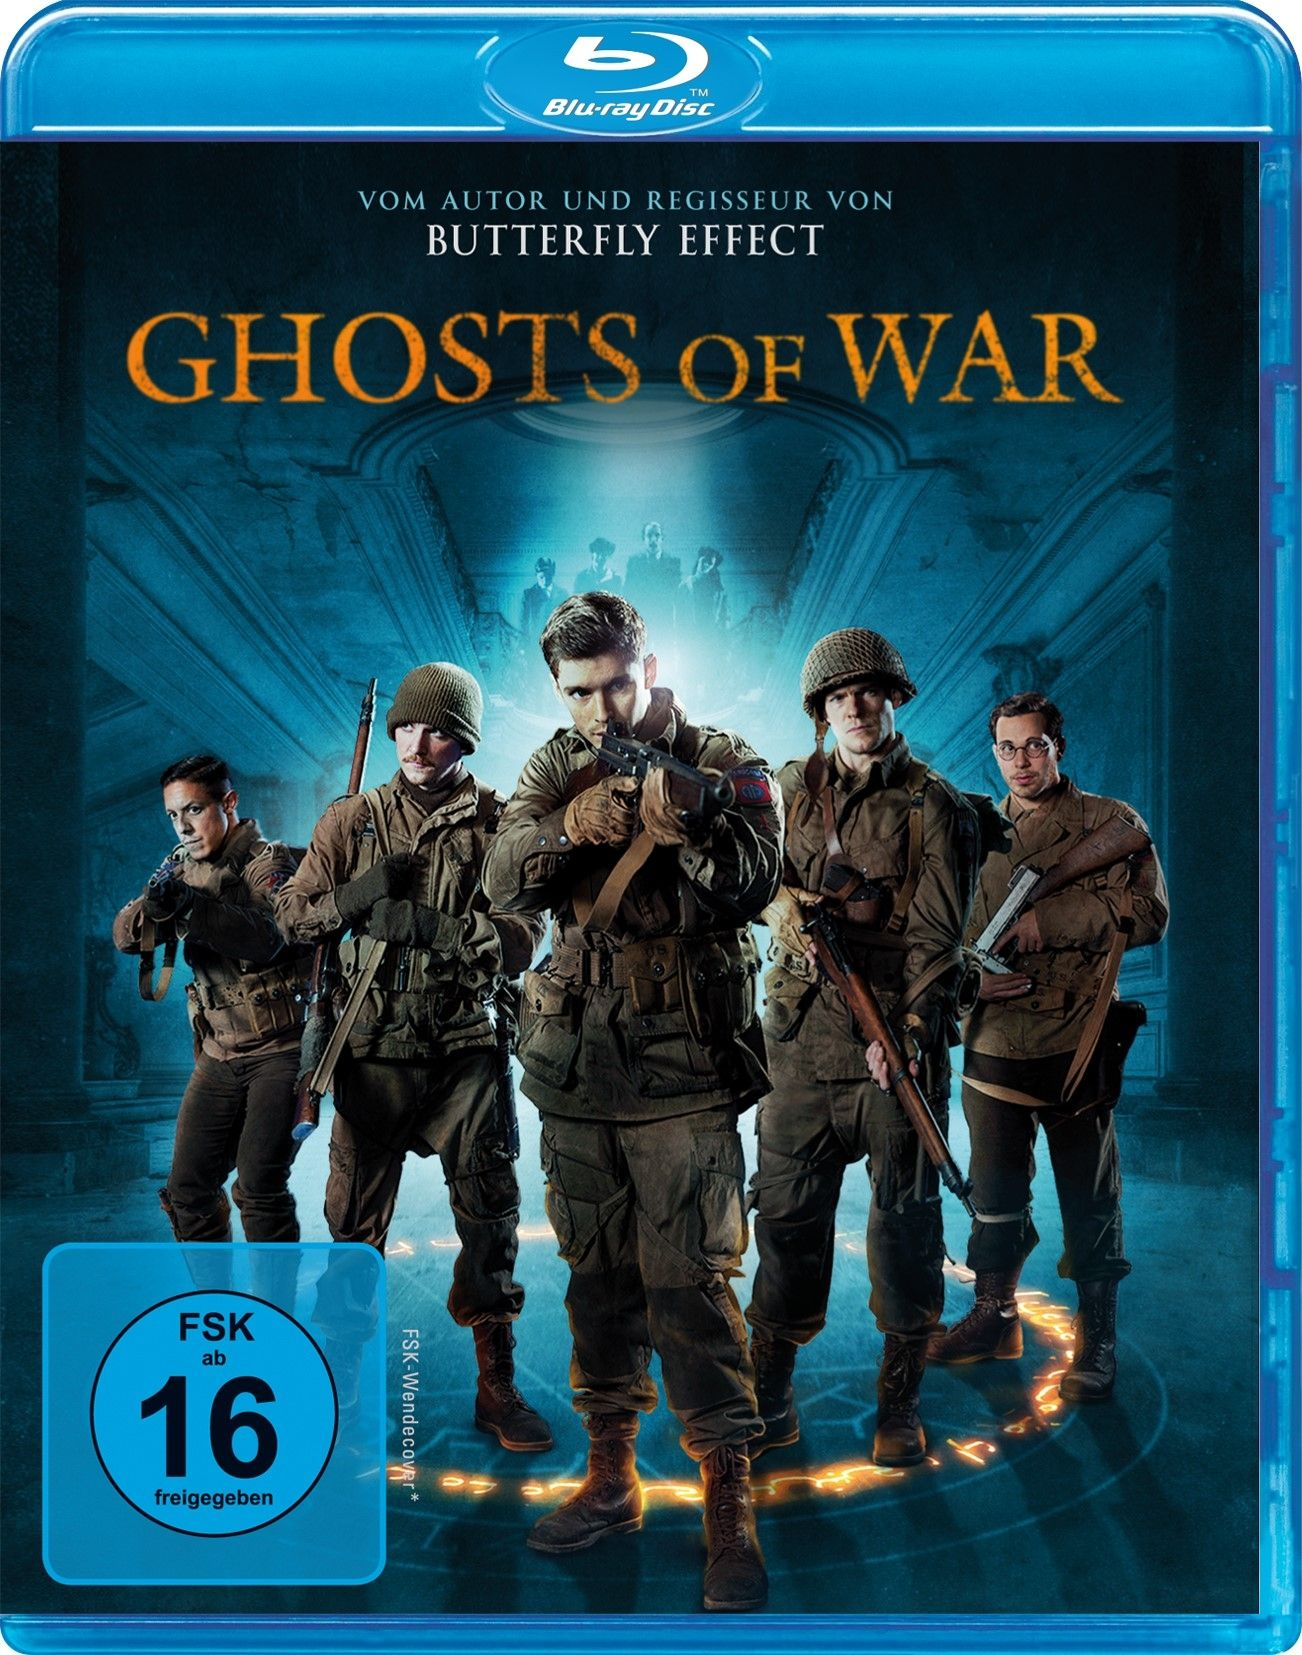 Ghosts of War (BLURAY)